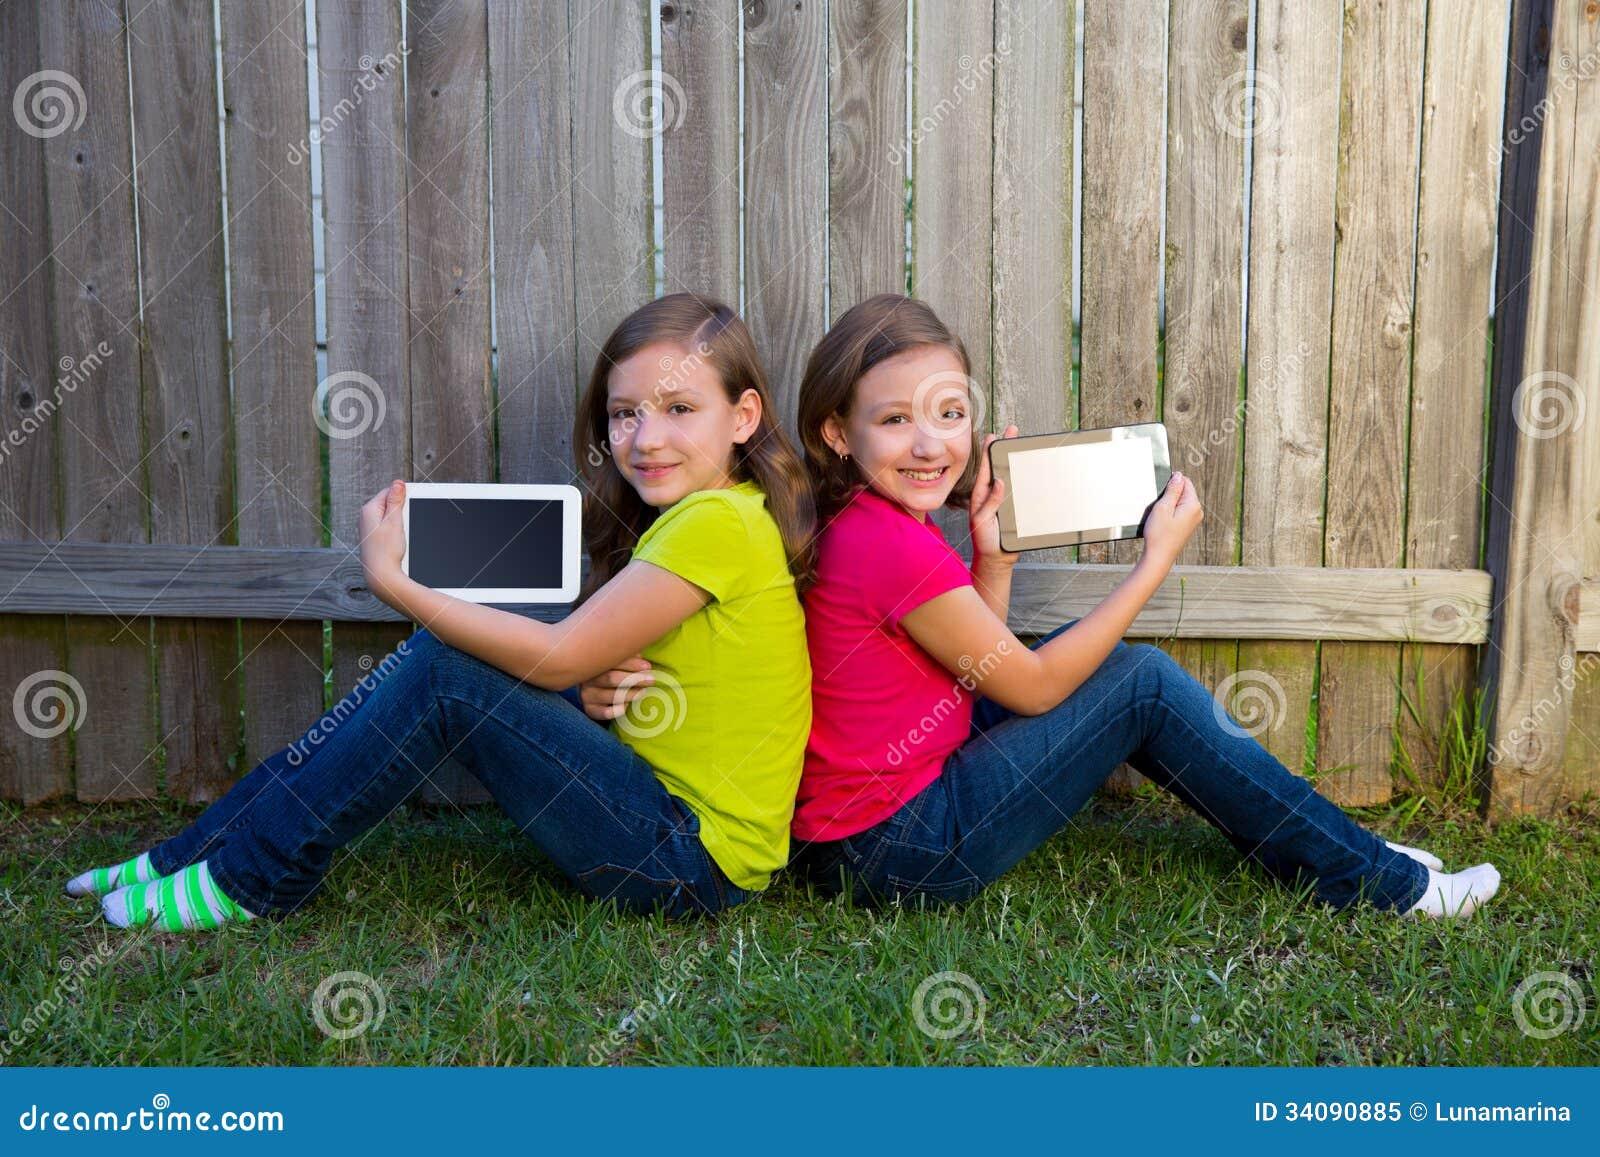 girls play in yard